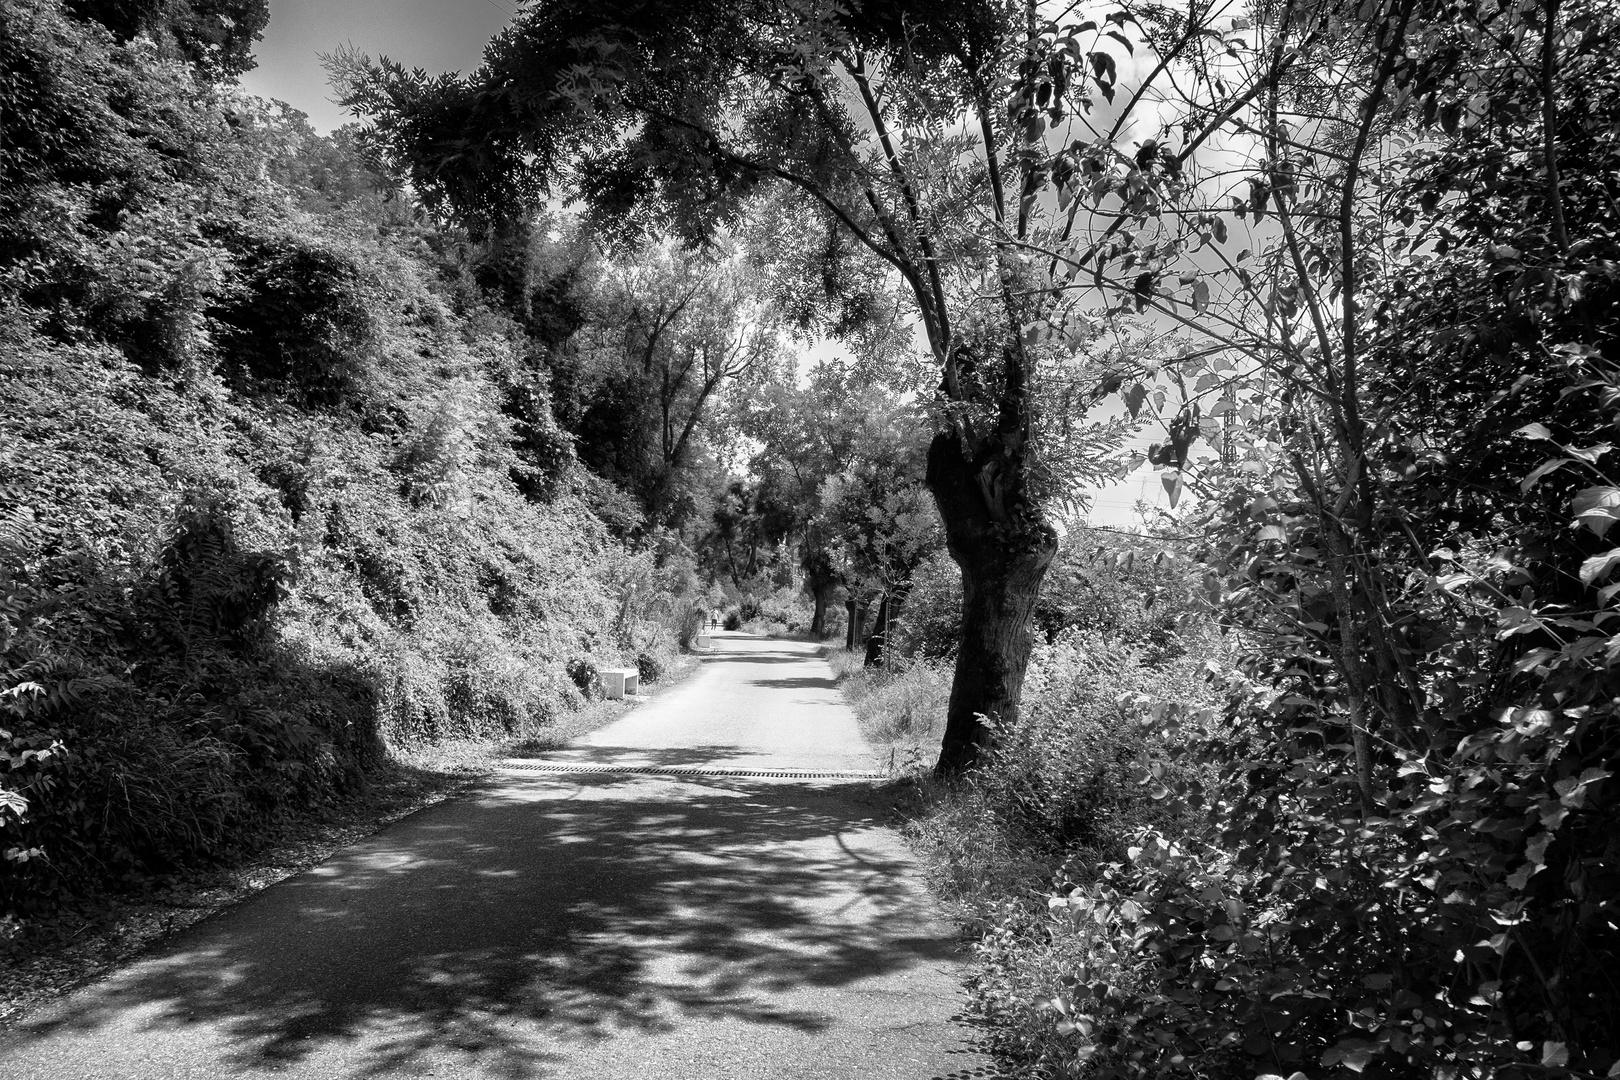 Strada verso Crespi d'Adda